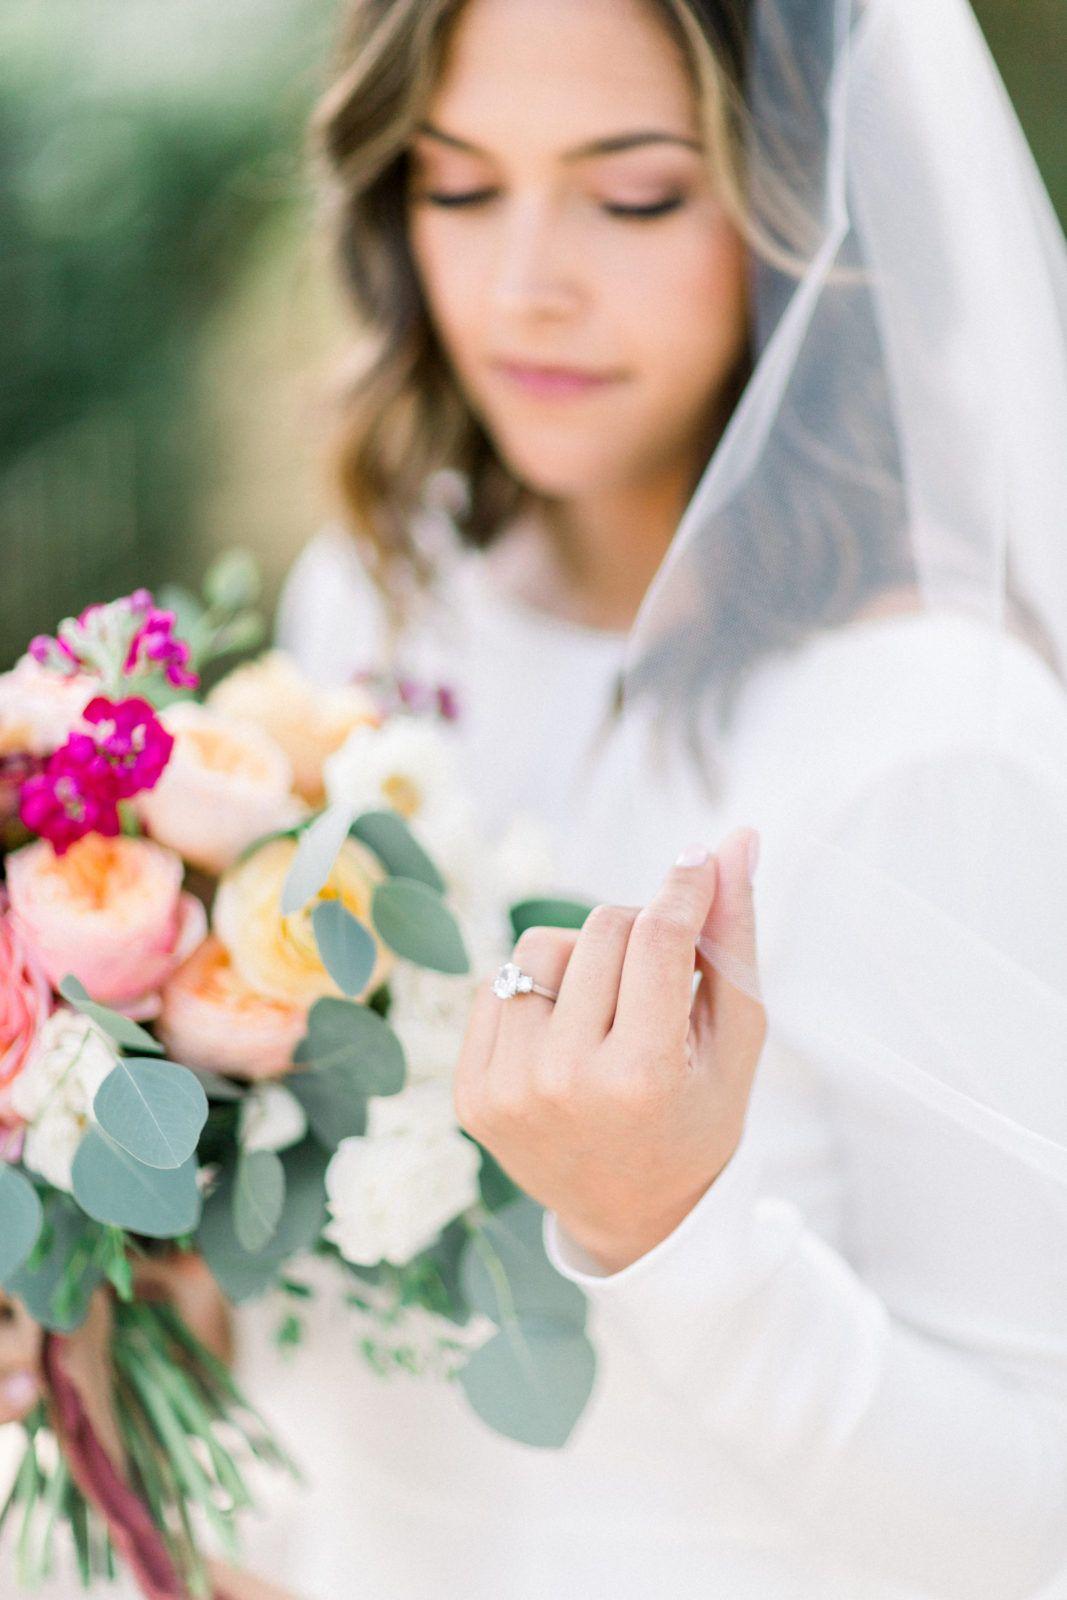 A Maravilla Gardens Wedding - Feathered Arrow Wedding Panning #bridalportraitposes